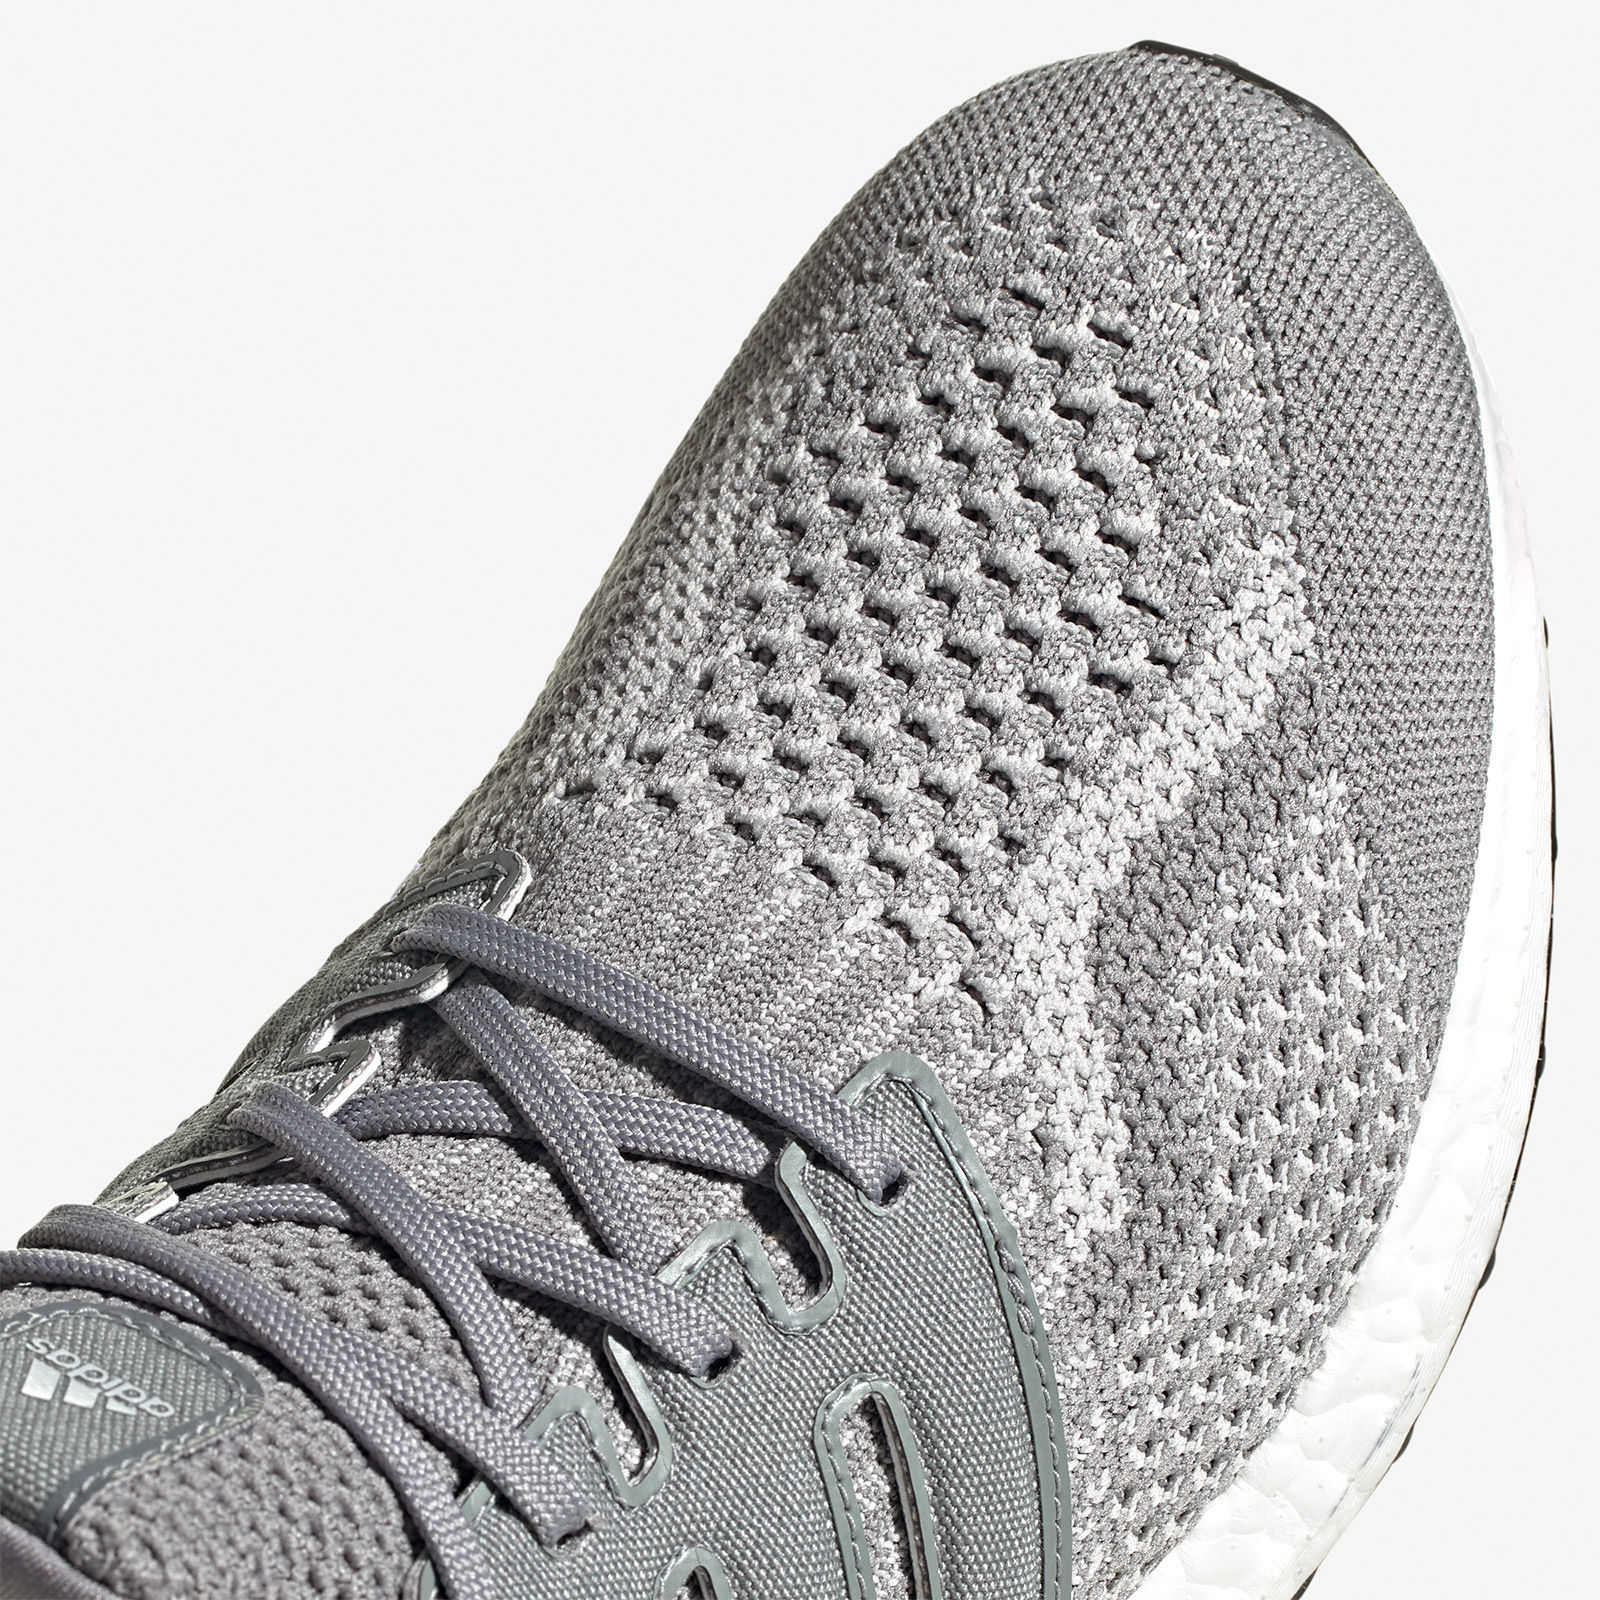 adidas Ultraboost 5.0 DNA - Fy9354 - SNS | sneakers & streetwear ...